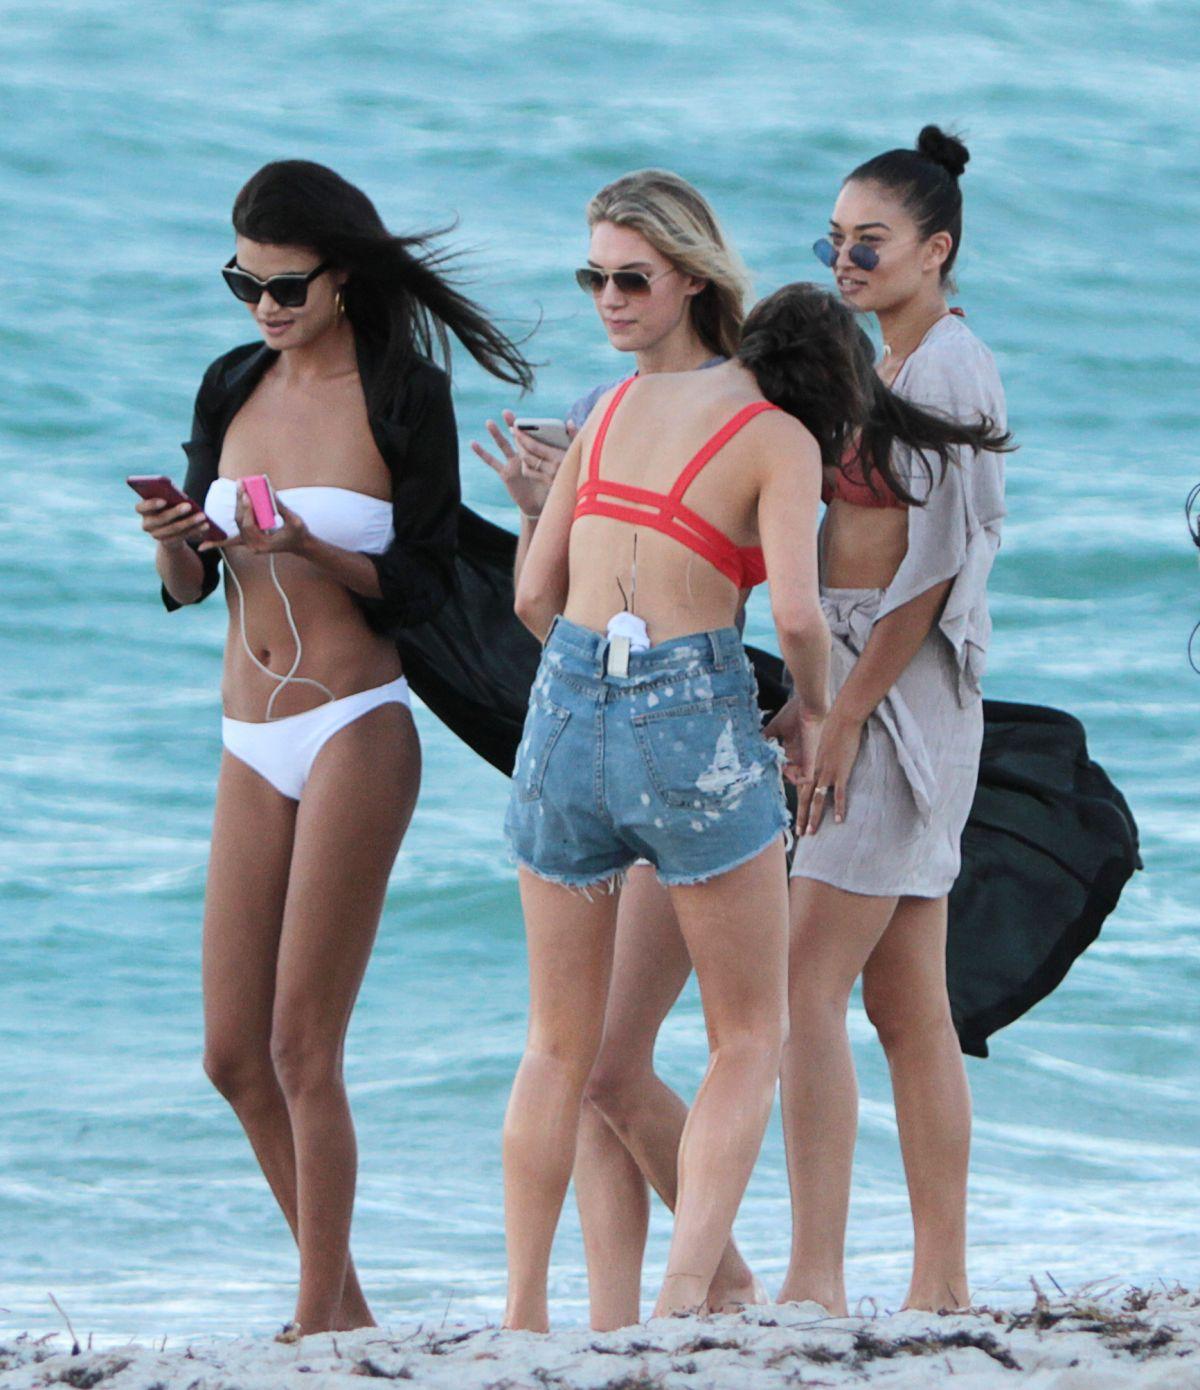 Shanina Shaik Caroline Lowe Olivia Culpo and Daniela Braga in Bikini Photoshoot in Miami Beach Pic 32 of 35